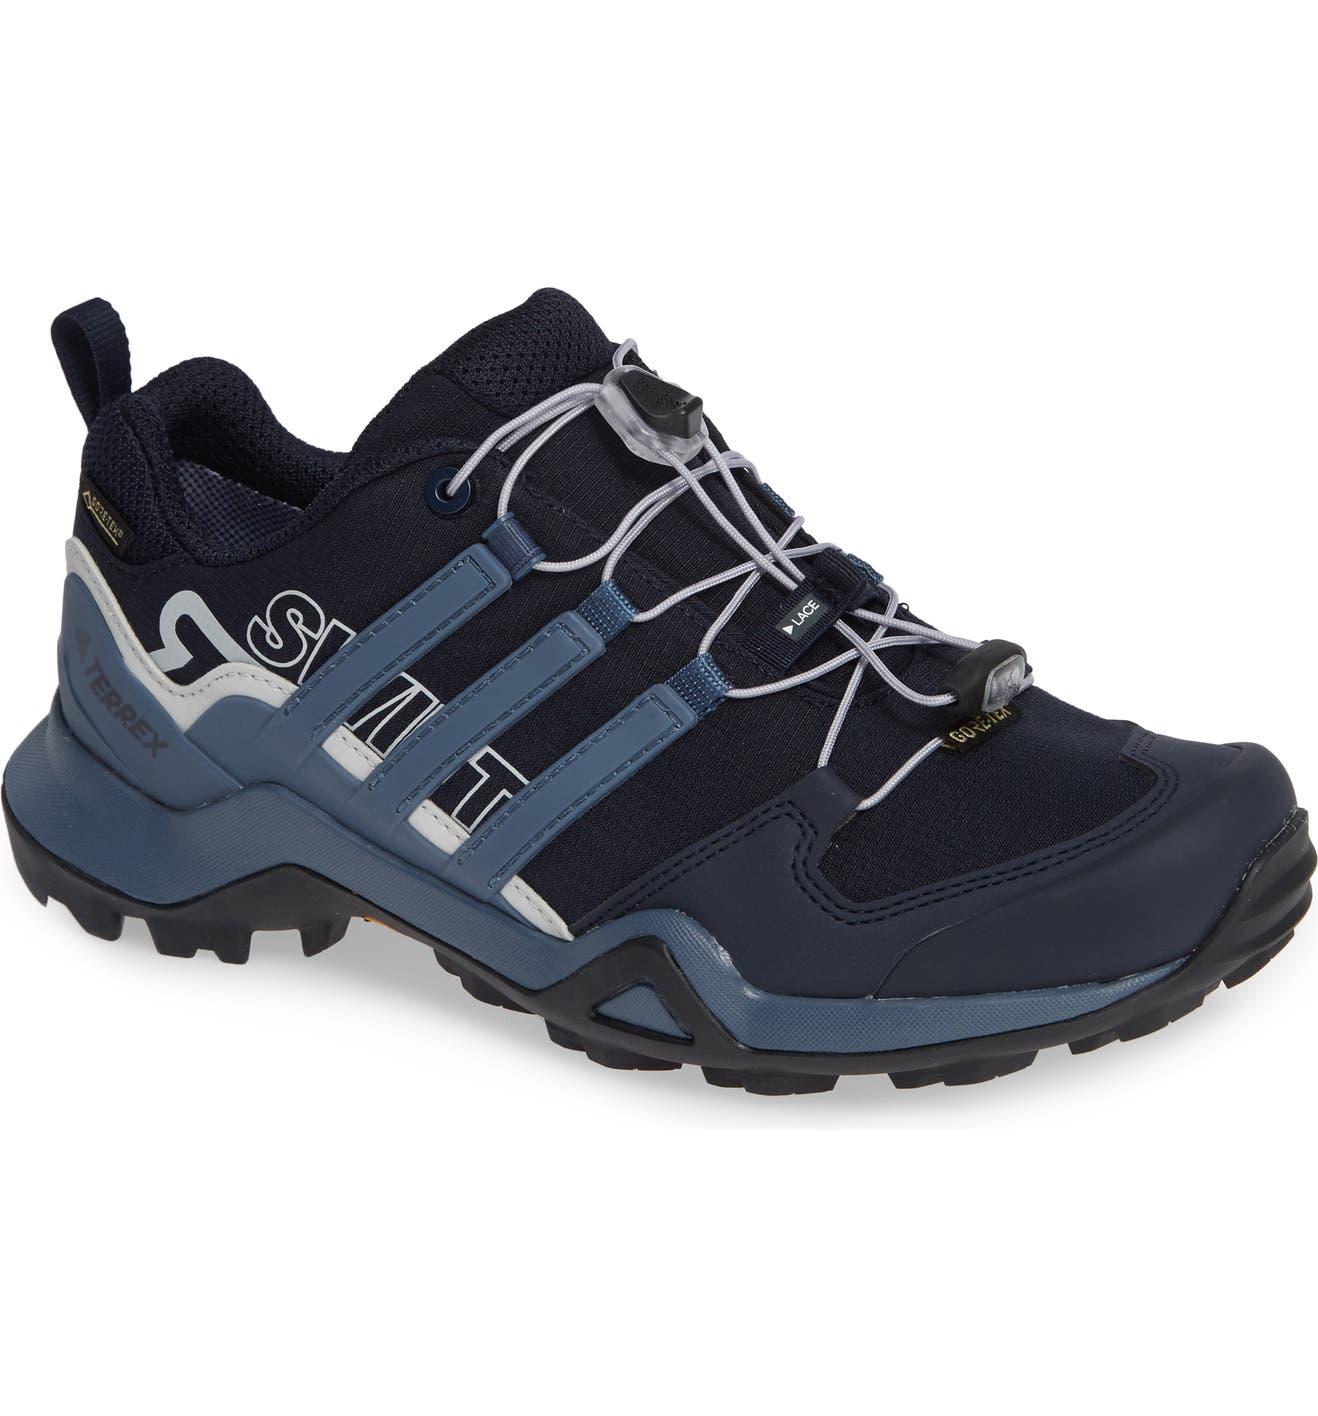 a04a3bfced8 adidas Terrex Swift R2 GTX Gore-Tex® Waterproof Hiking Shoe (Women ...